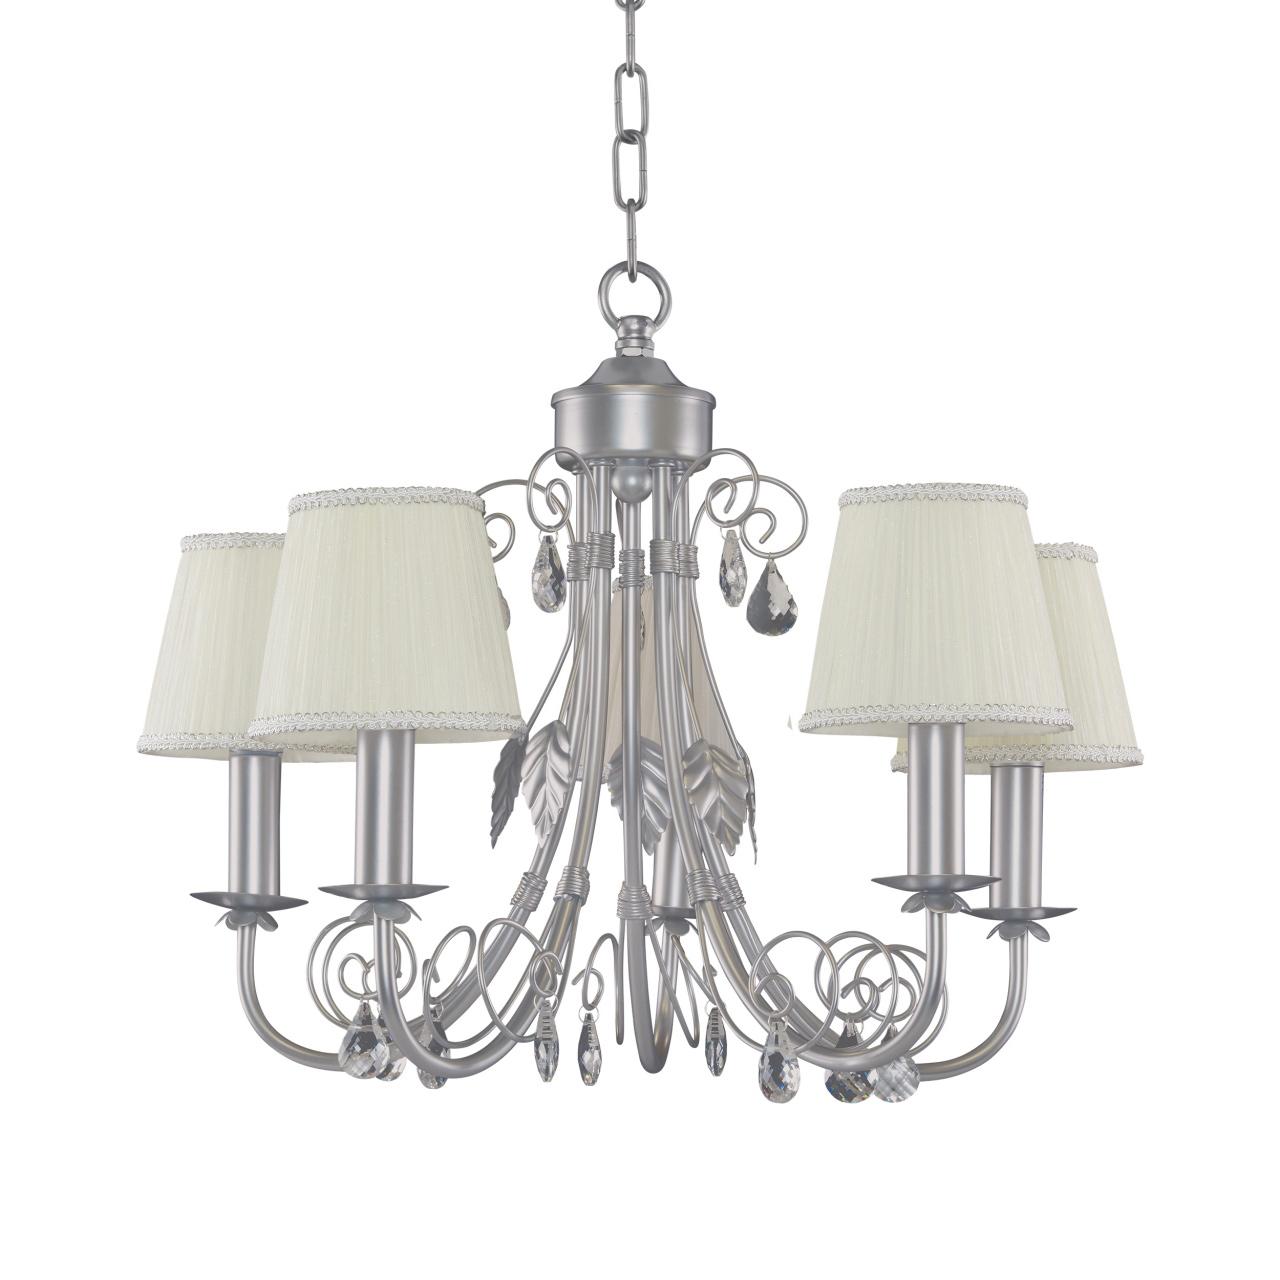 Люстра подвесная Modesto 5х40W E14 серебро Lightstar 781054